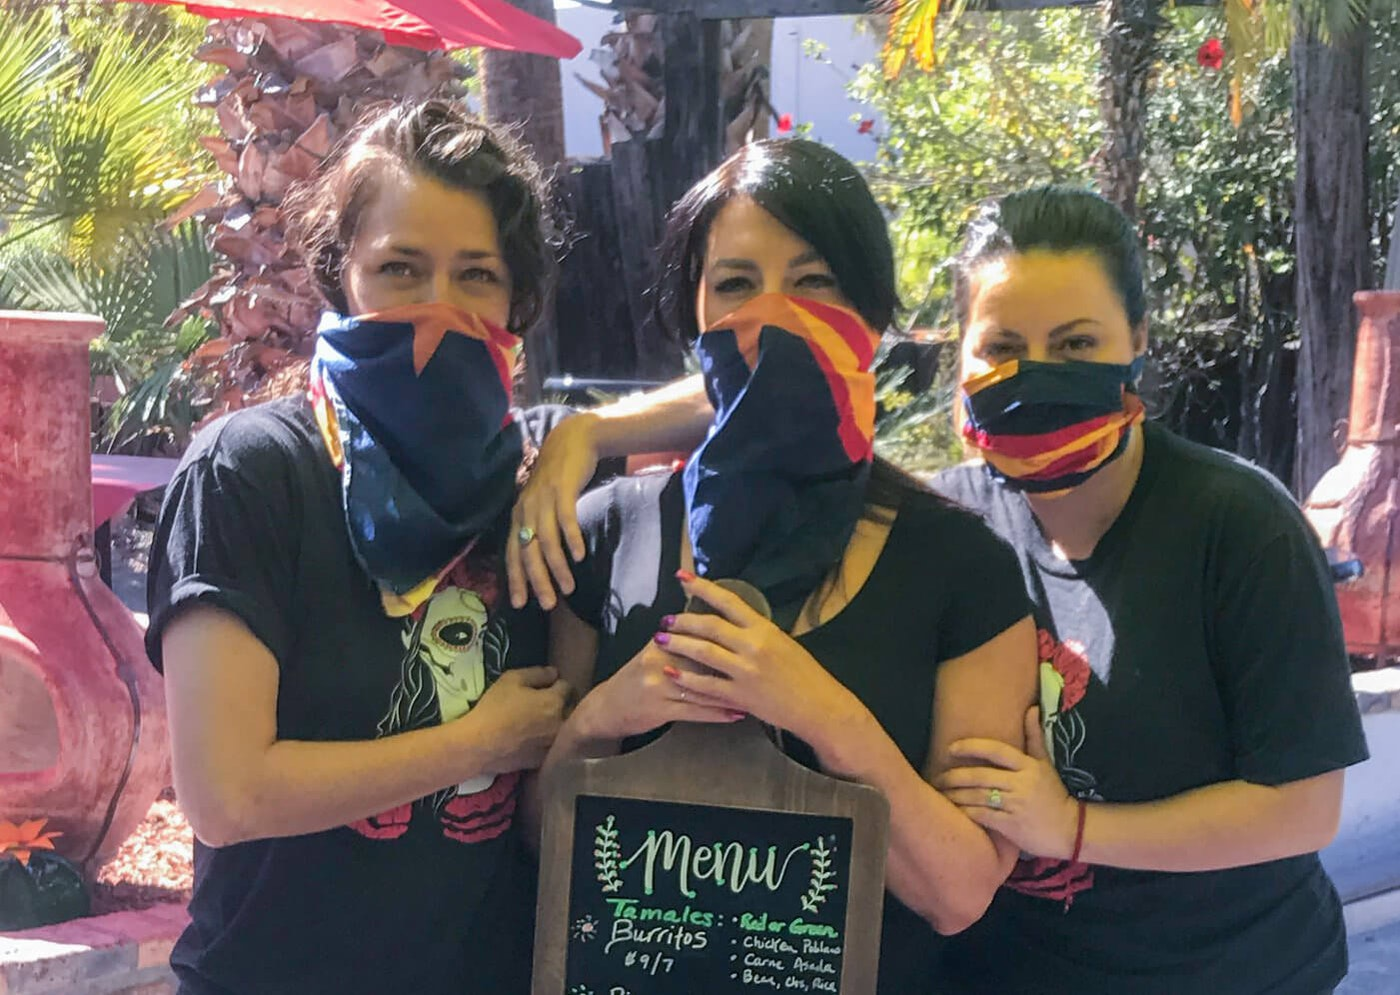 three women wearing face masks holding a menu